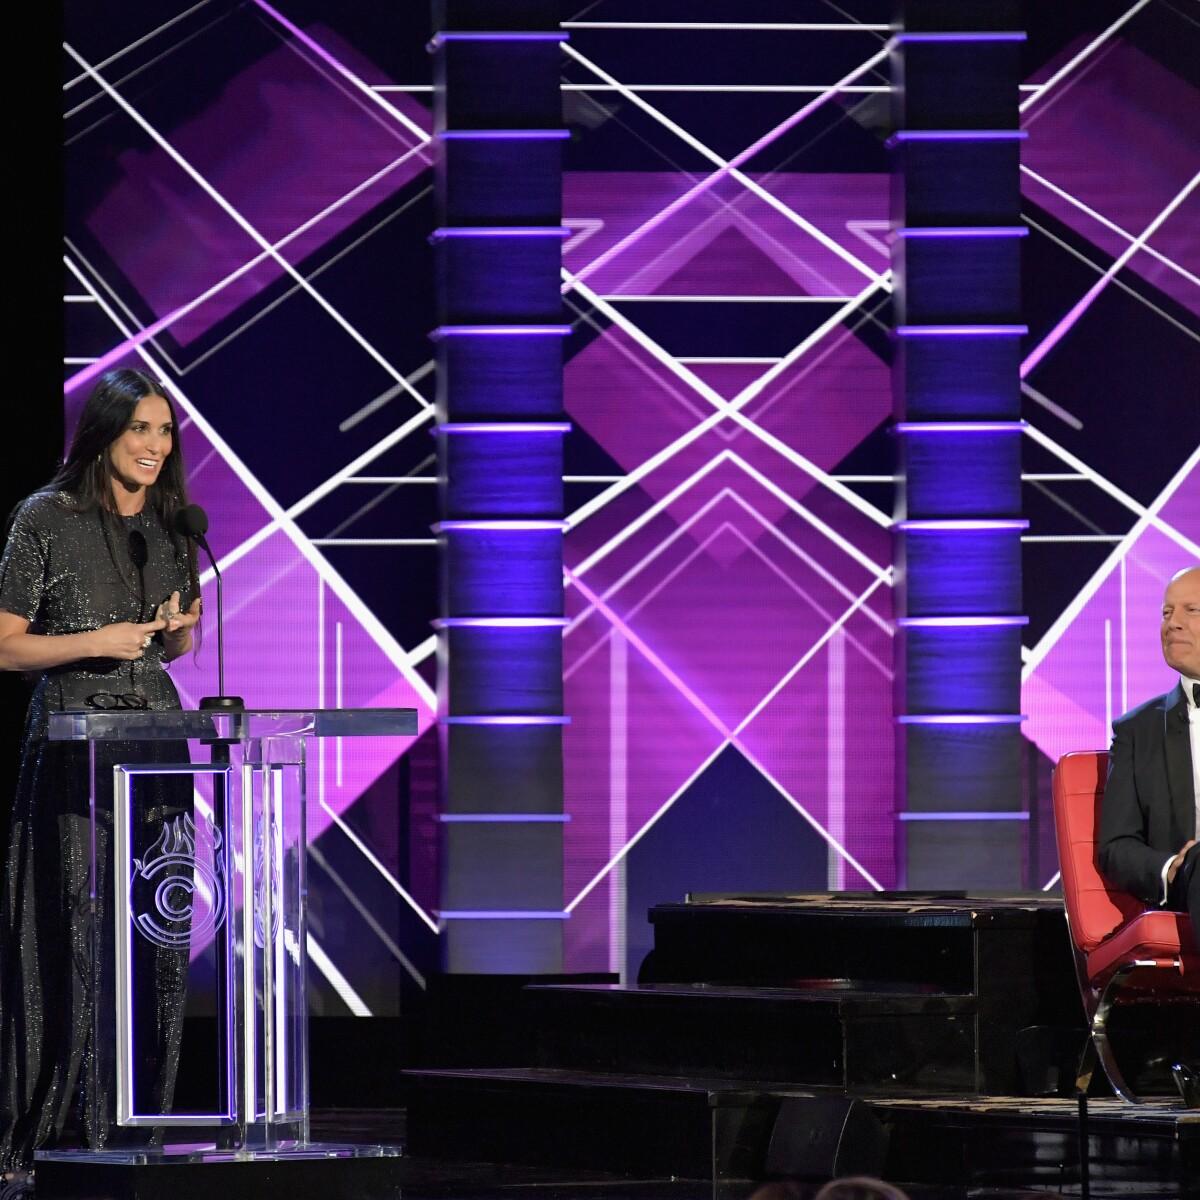 La burla de Demi Moore a Bruce Willis en el 'Roast' de Comedy Central